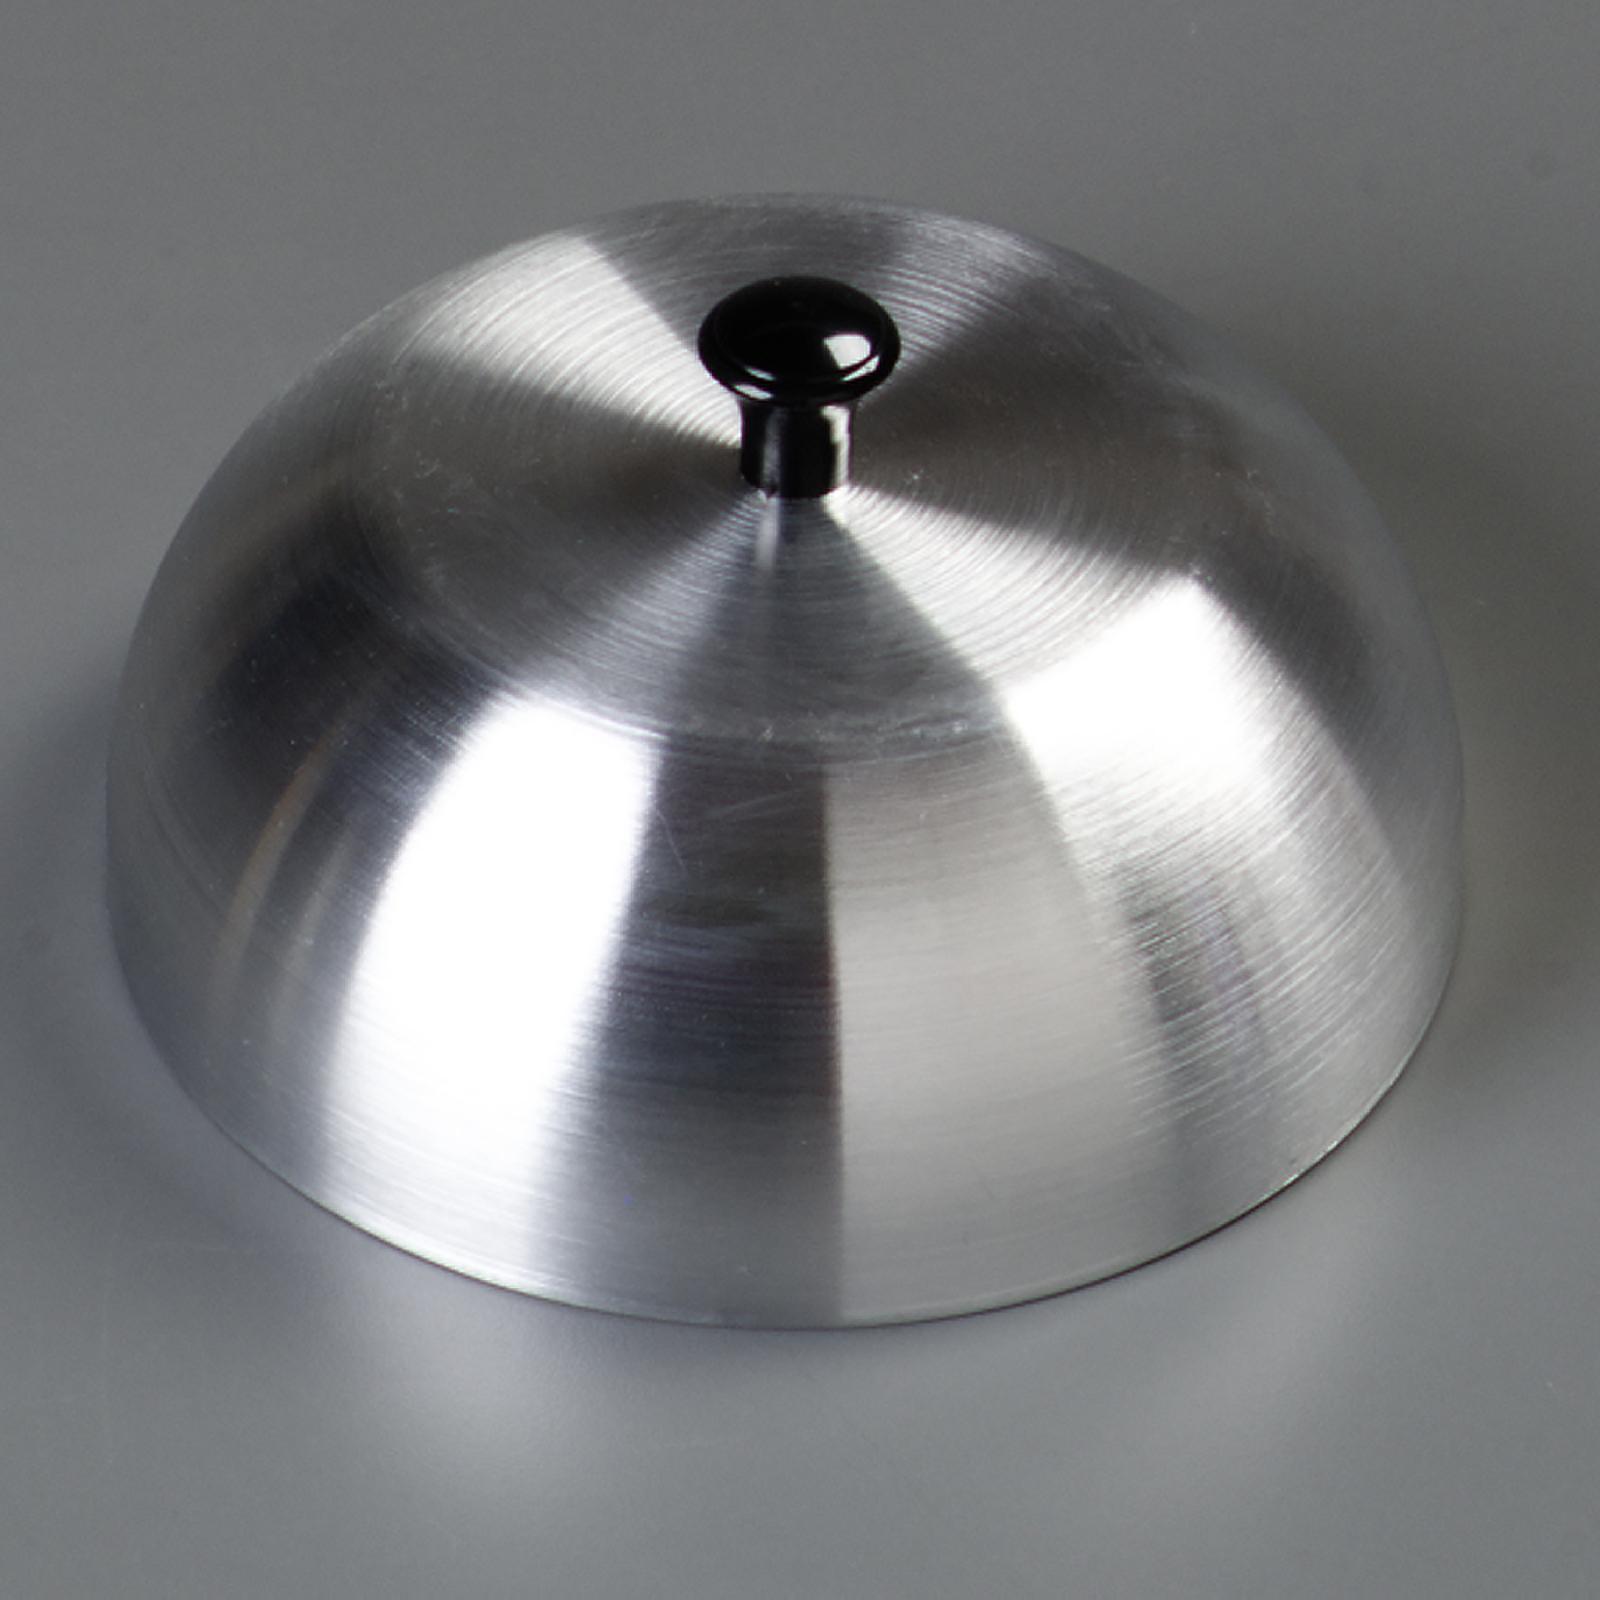 Carlisle 60103 grill basting cover